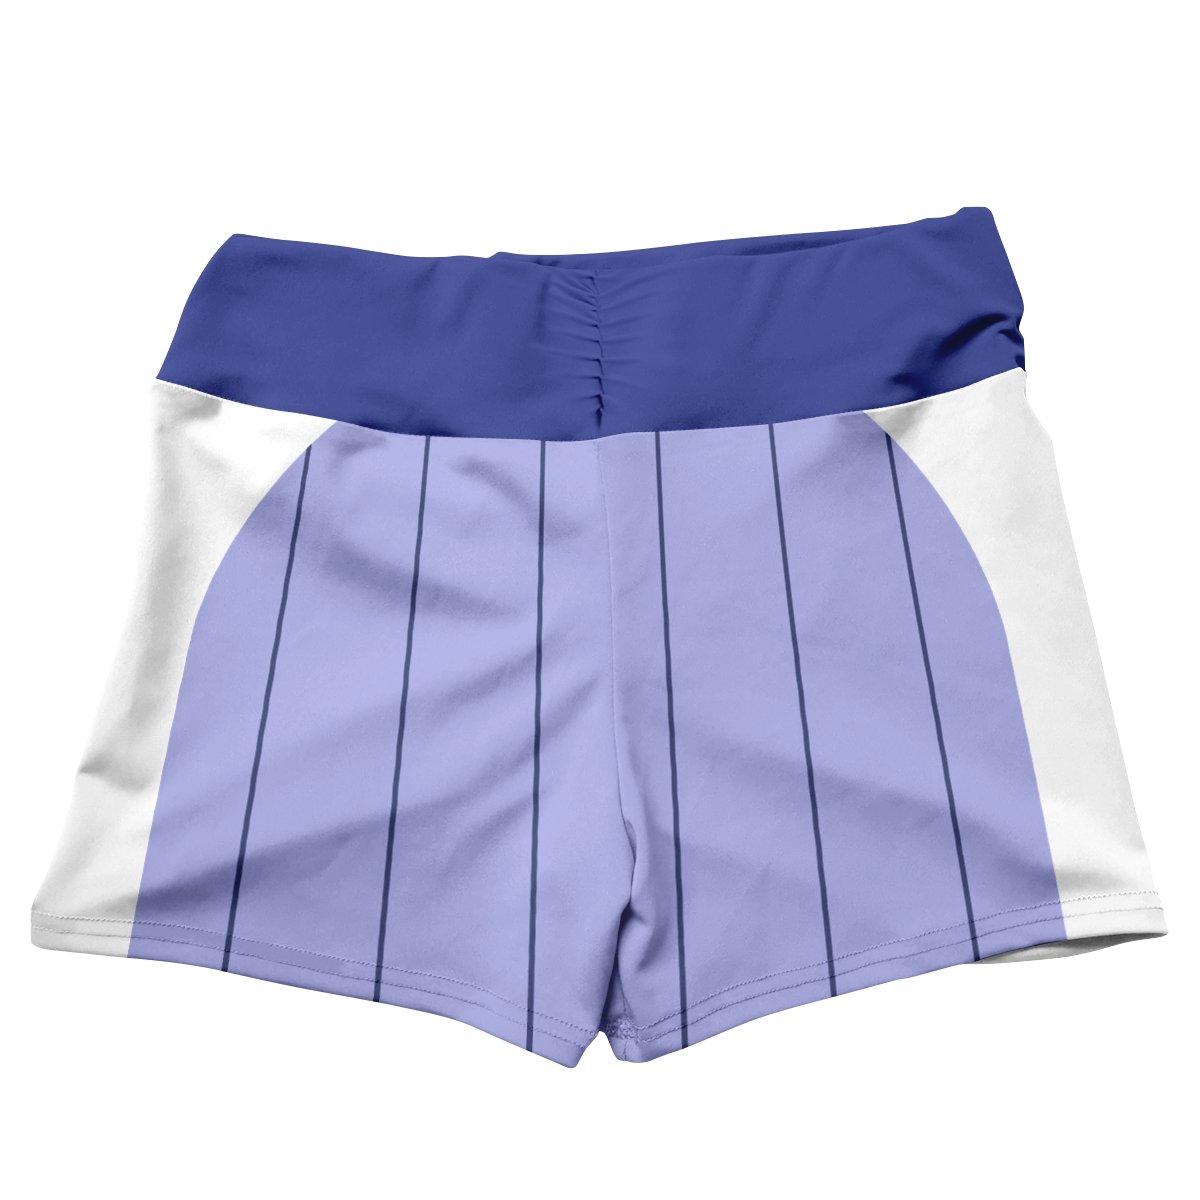 hinata summer active wear set 204592 - Anime Swimsuits